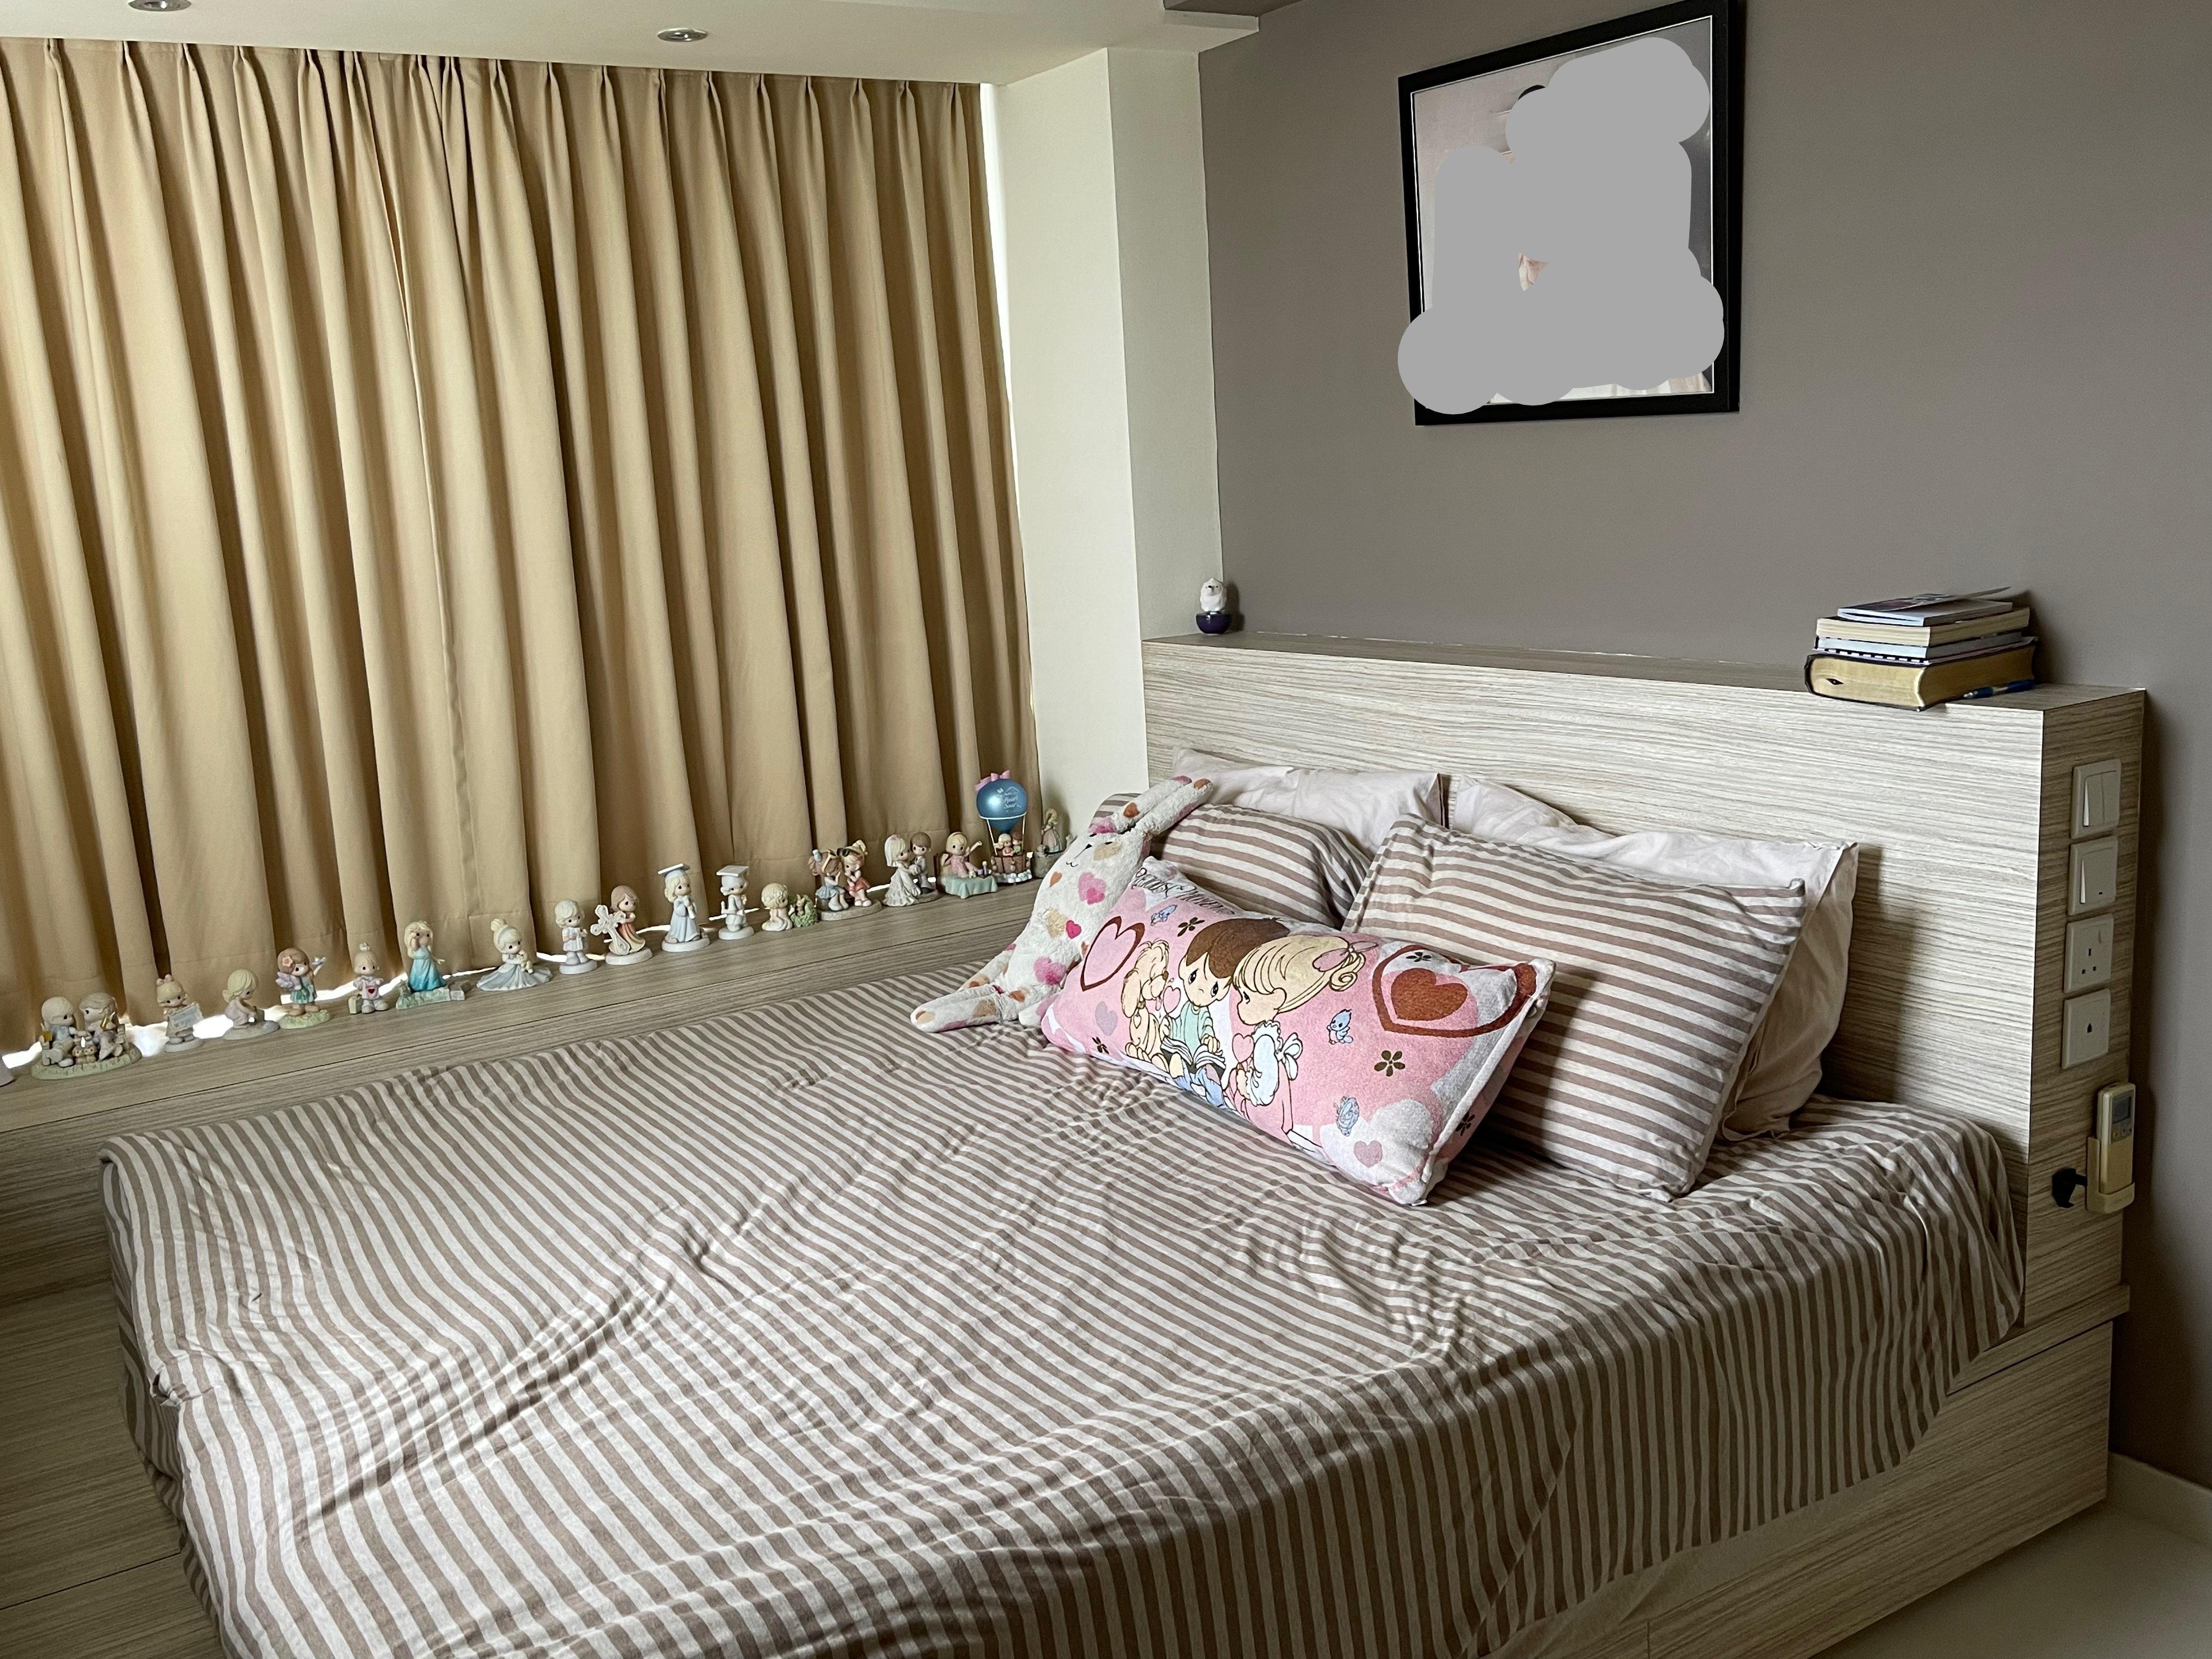 Very spacious master room